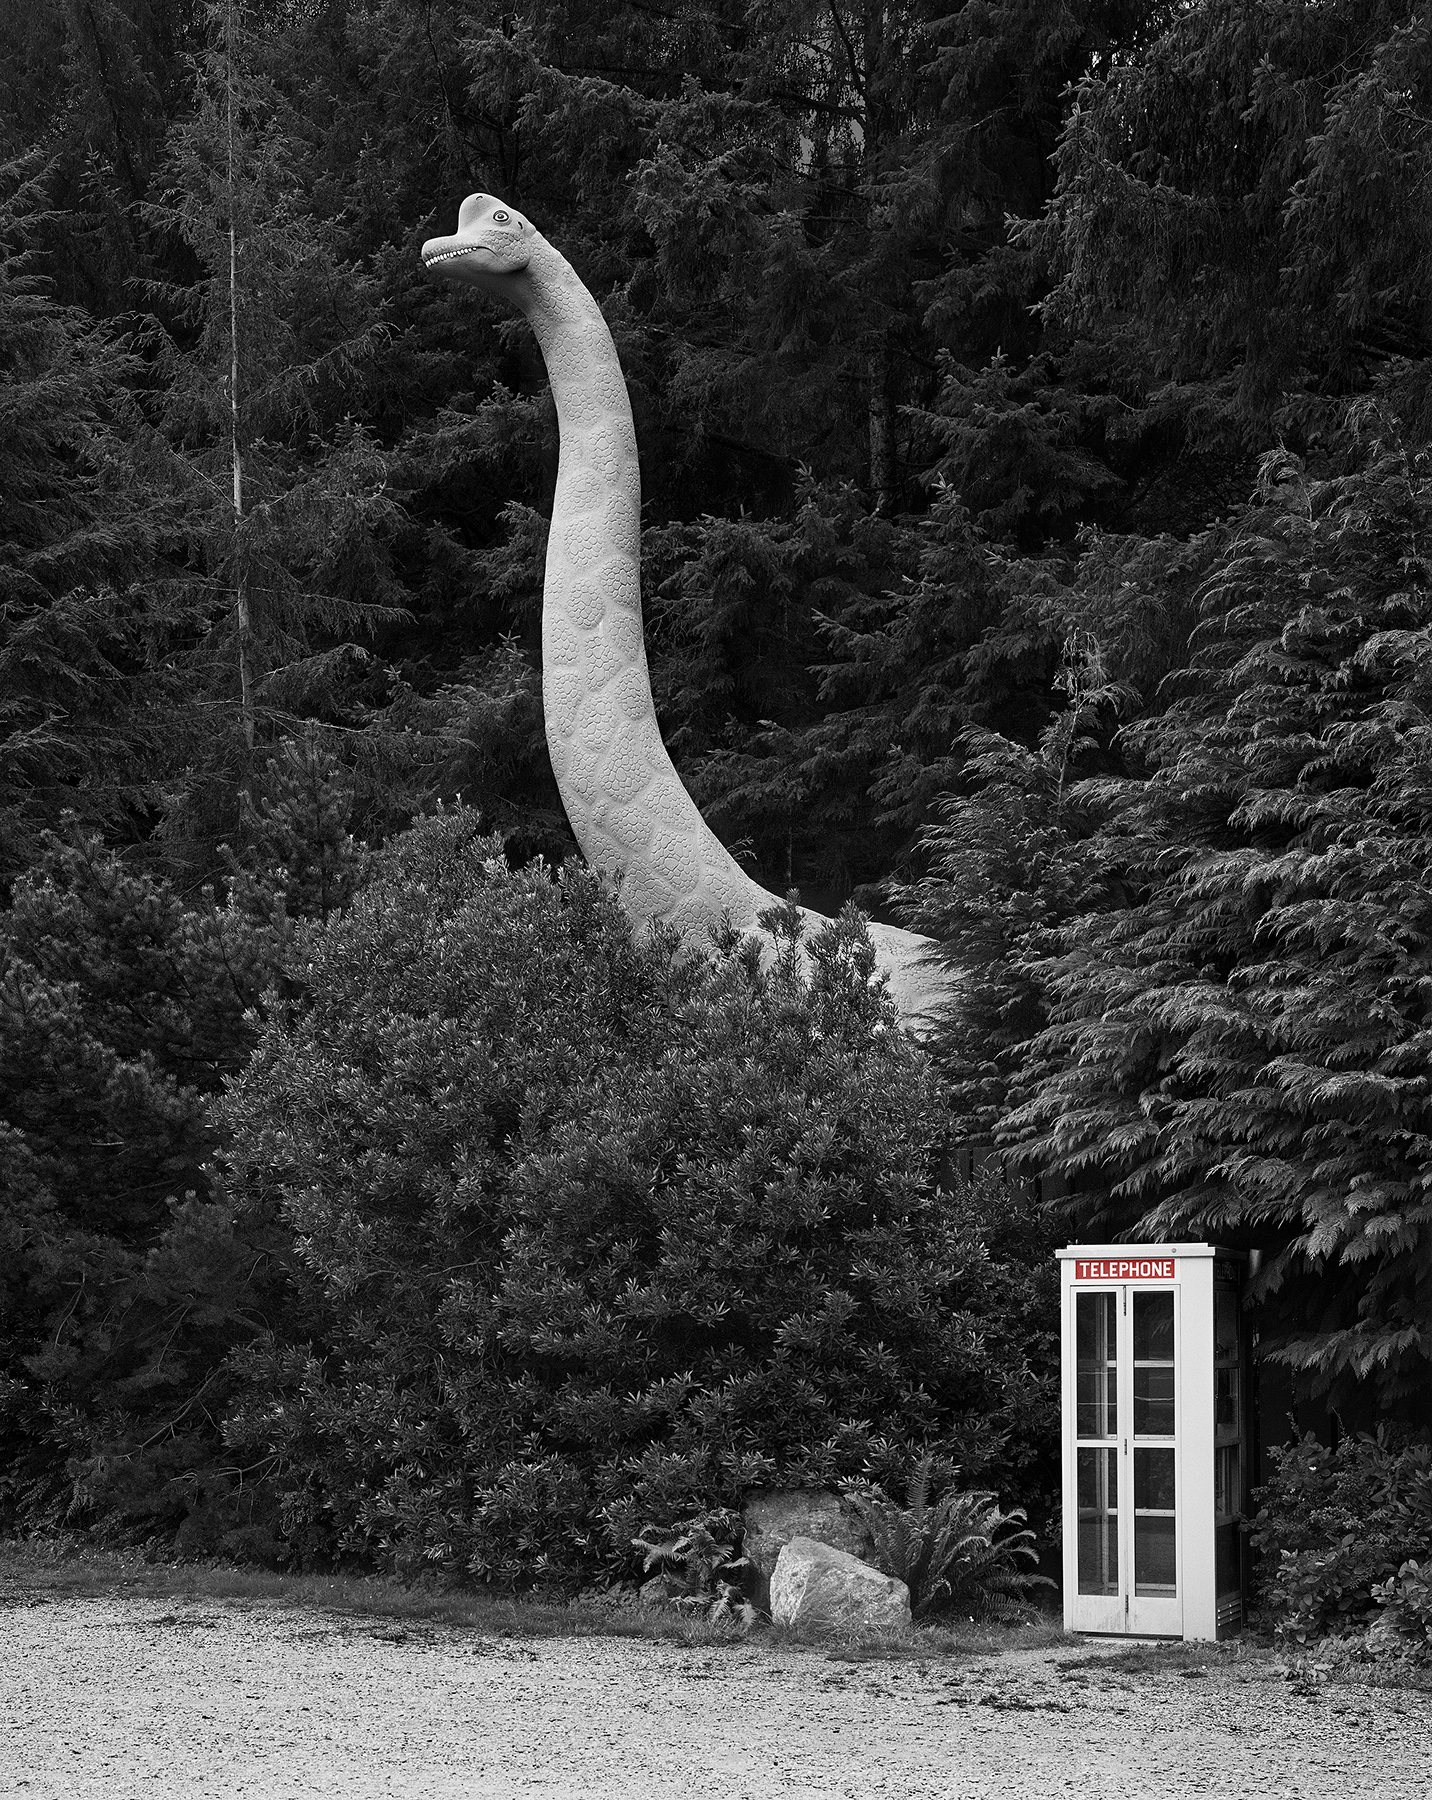 Dinosaur and Telephone Booth, Oregon, 1979/2015